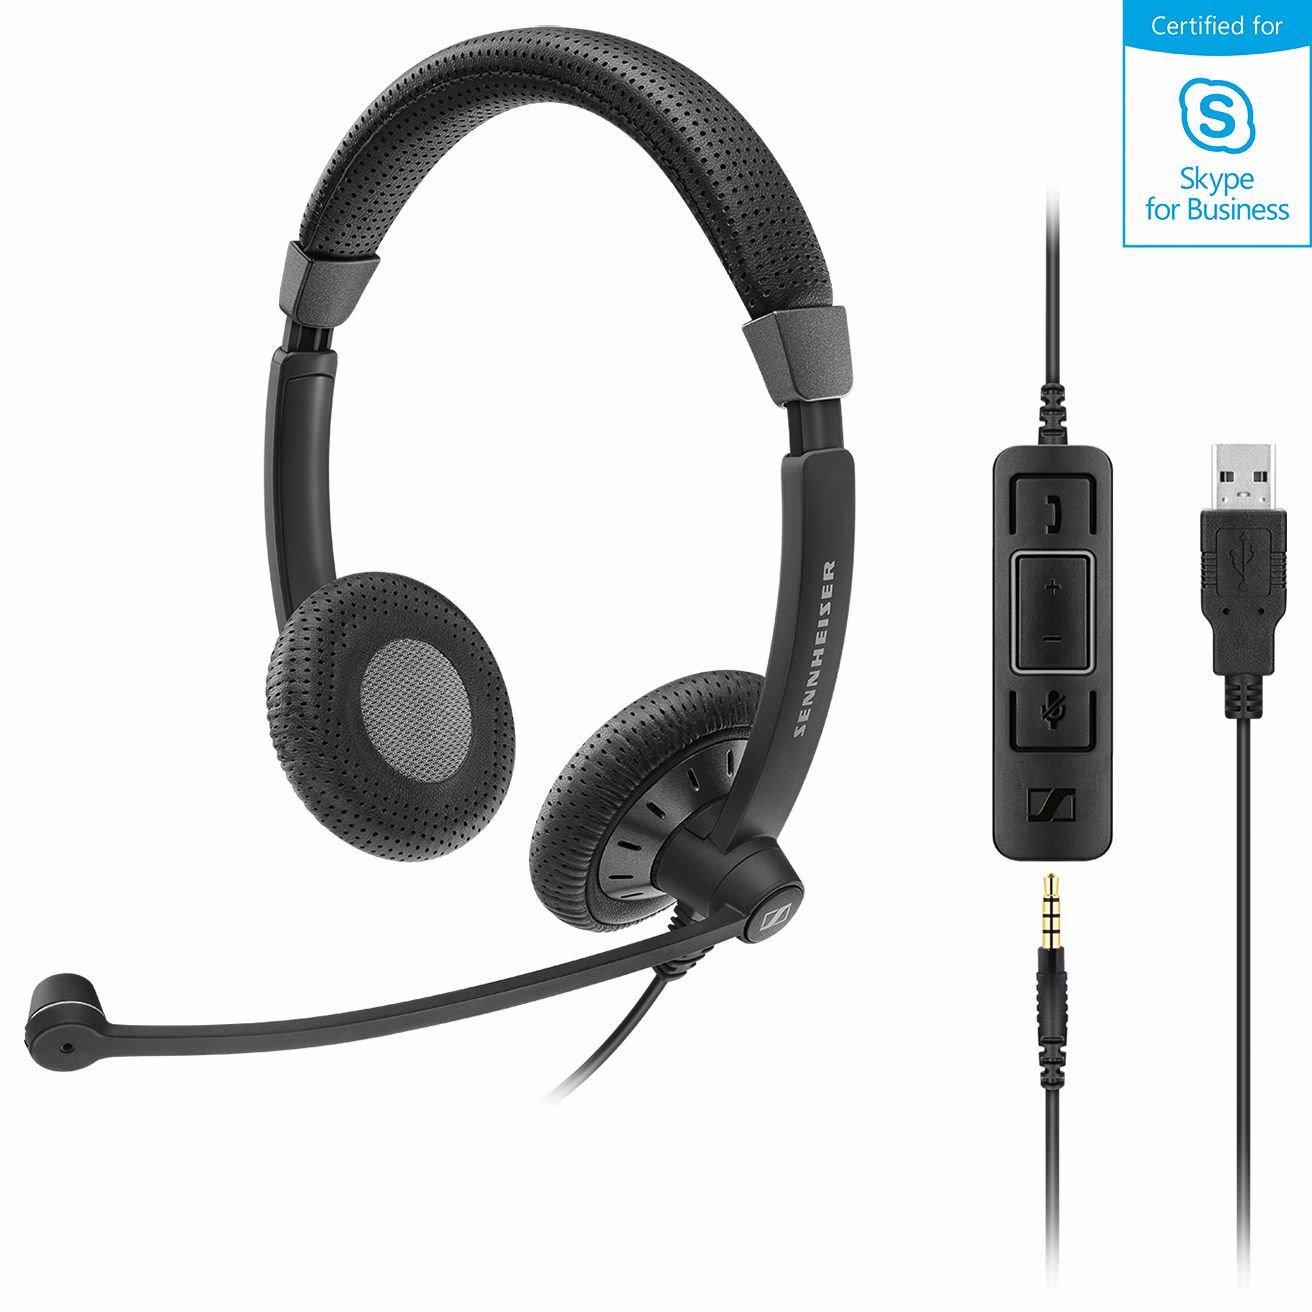 Sennheiser Epos I Sennheiser SC75 Usb Stereo Headset, Usb / 3.5MM Connections, Teams Certified, Noise Cancel Mic, Lightweight, 2 YR Warranty